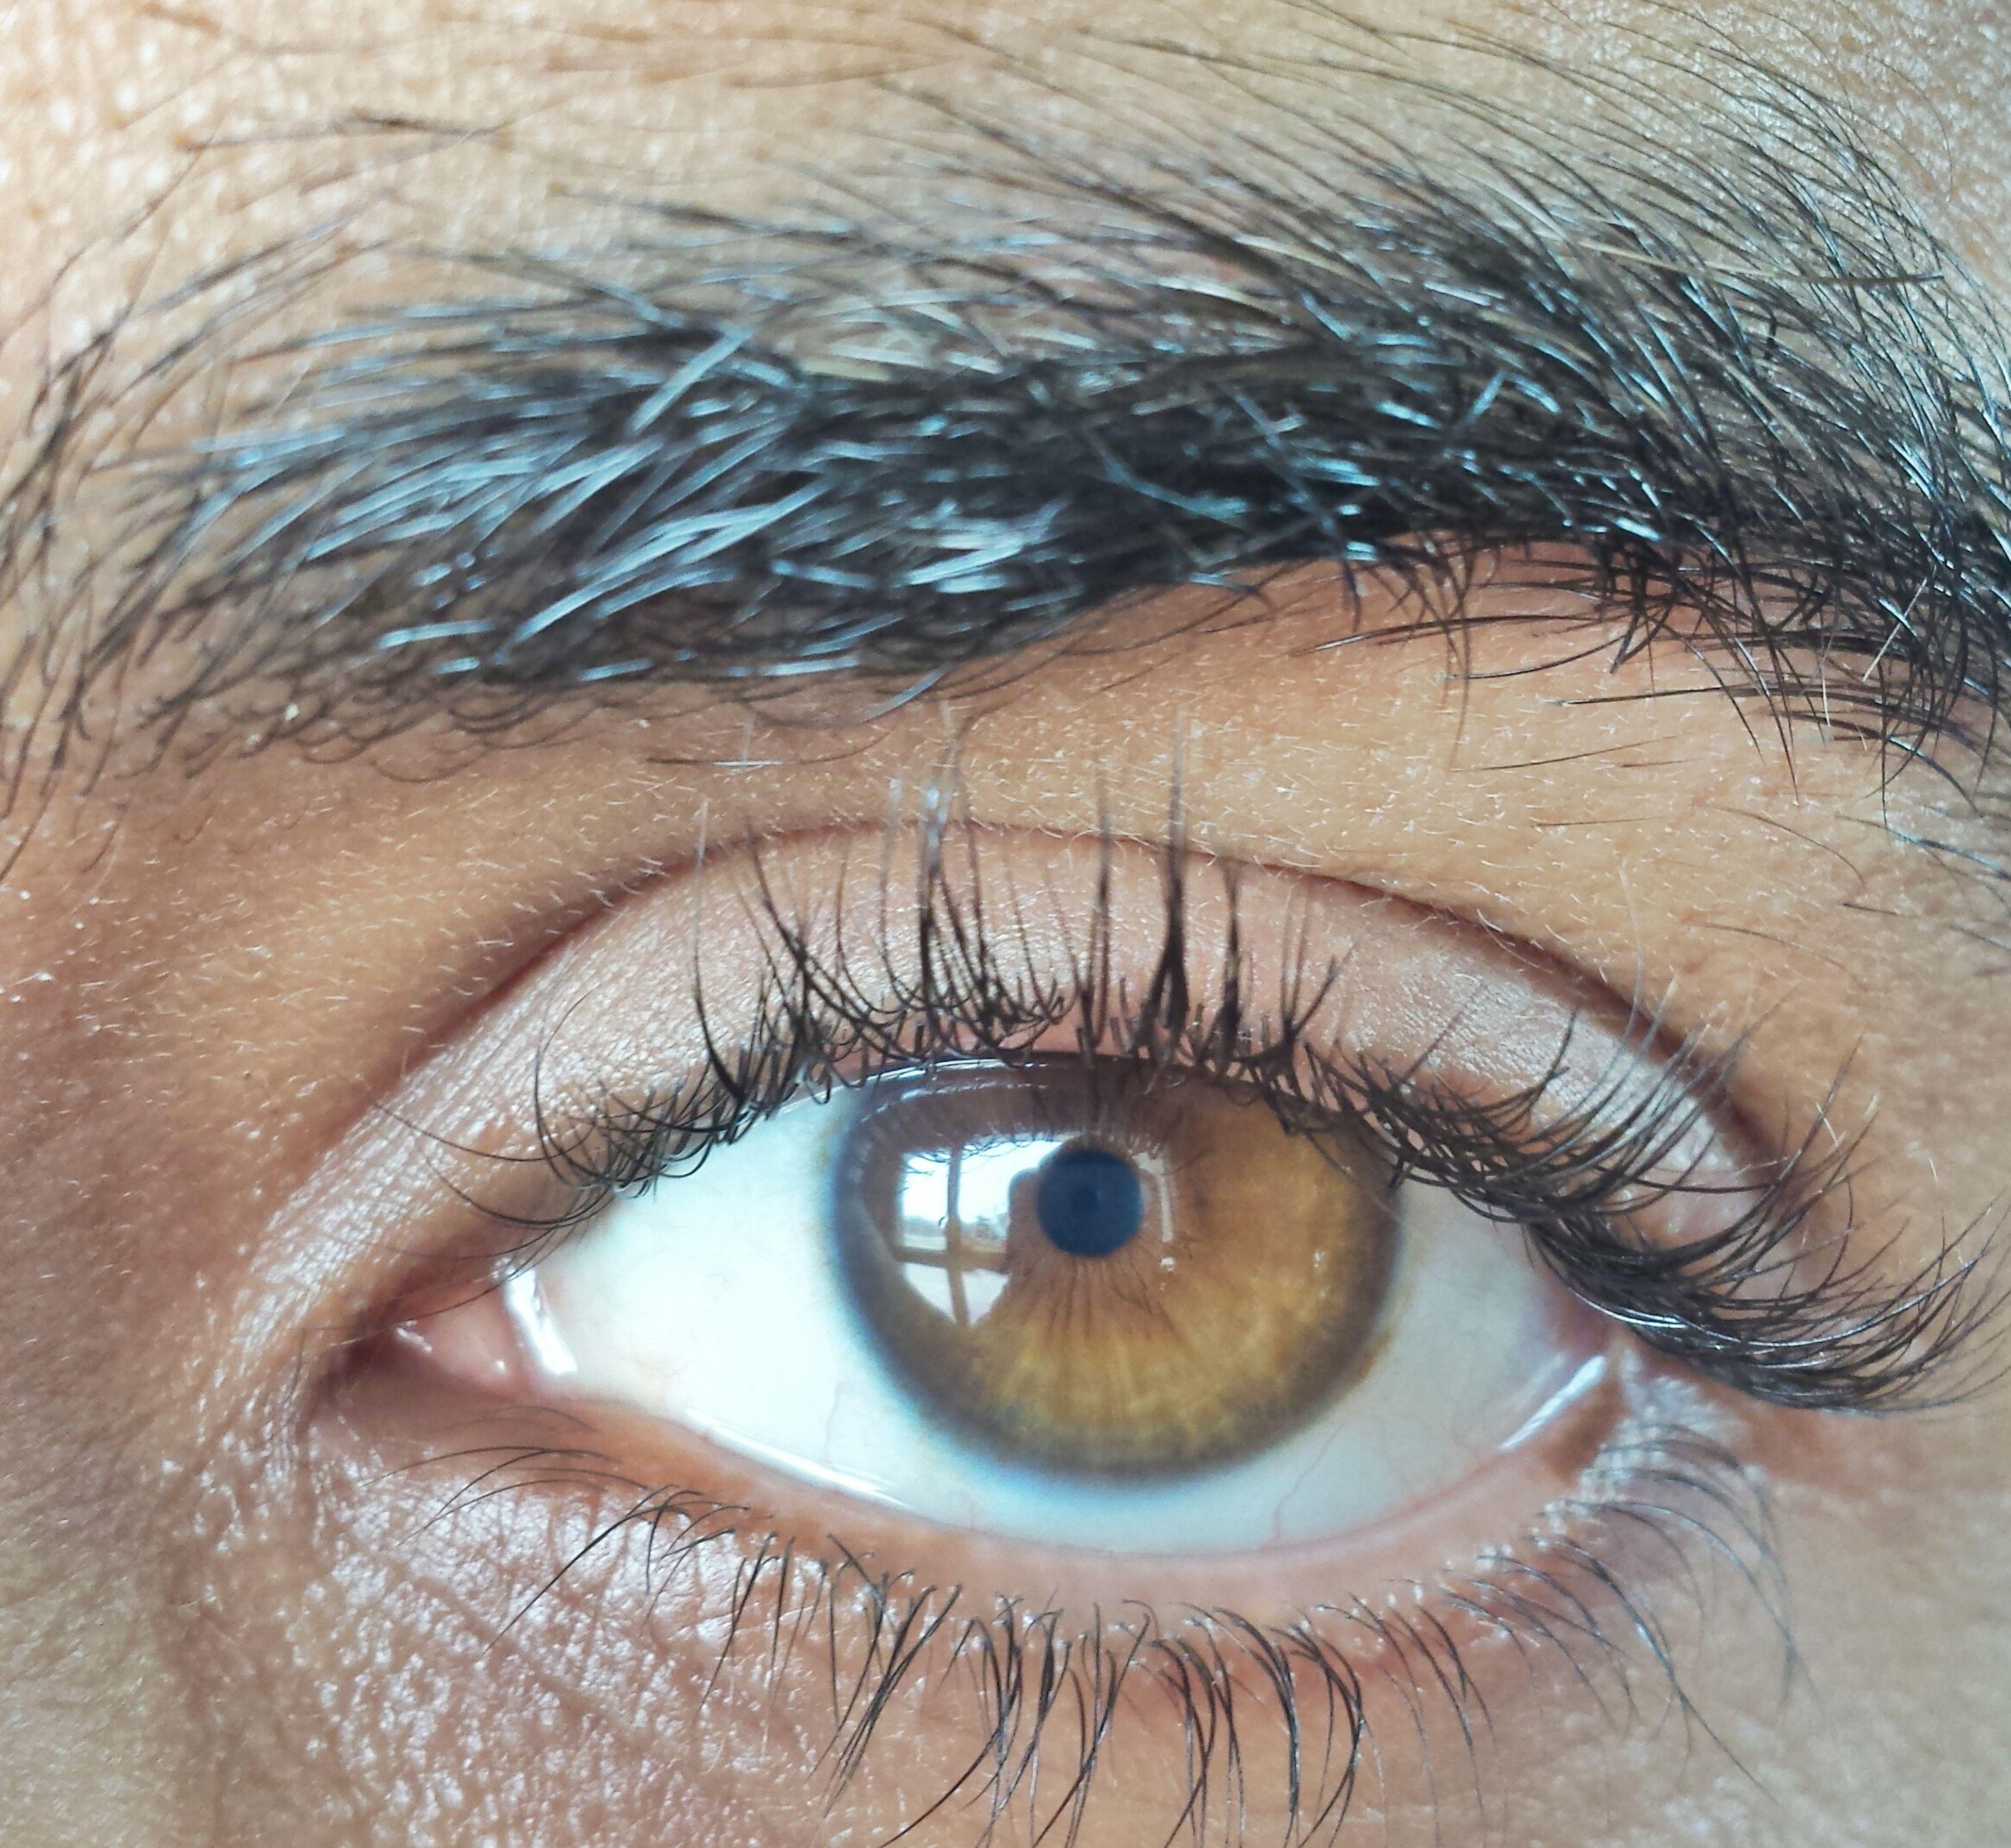 human eye, eyelash, eyesight, close-up, sensory perception, looking at camera, portrait, full frame, part of, iris - eye, human skin, extreme close-up, eyeball, human face, vision, eyebrow, extreme close up